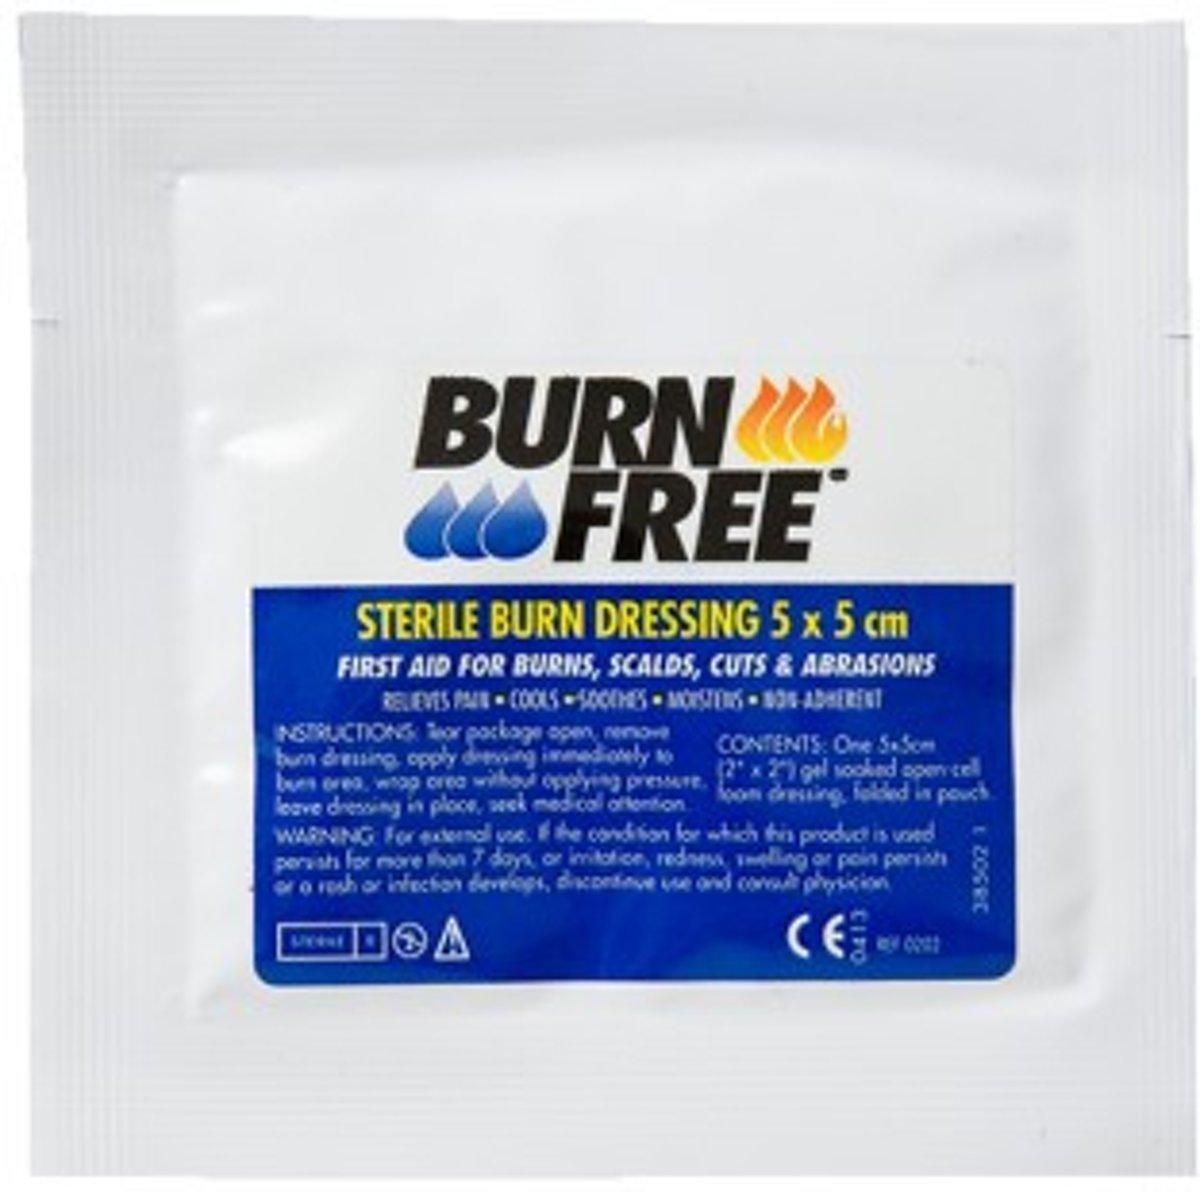 Burnfree Burn Dressing 5x5 Cm (1st)